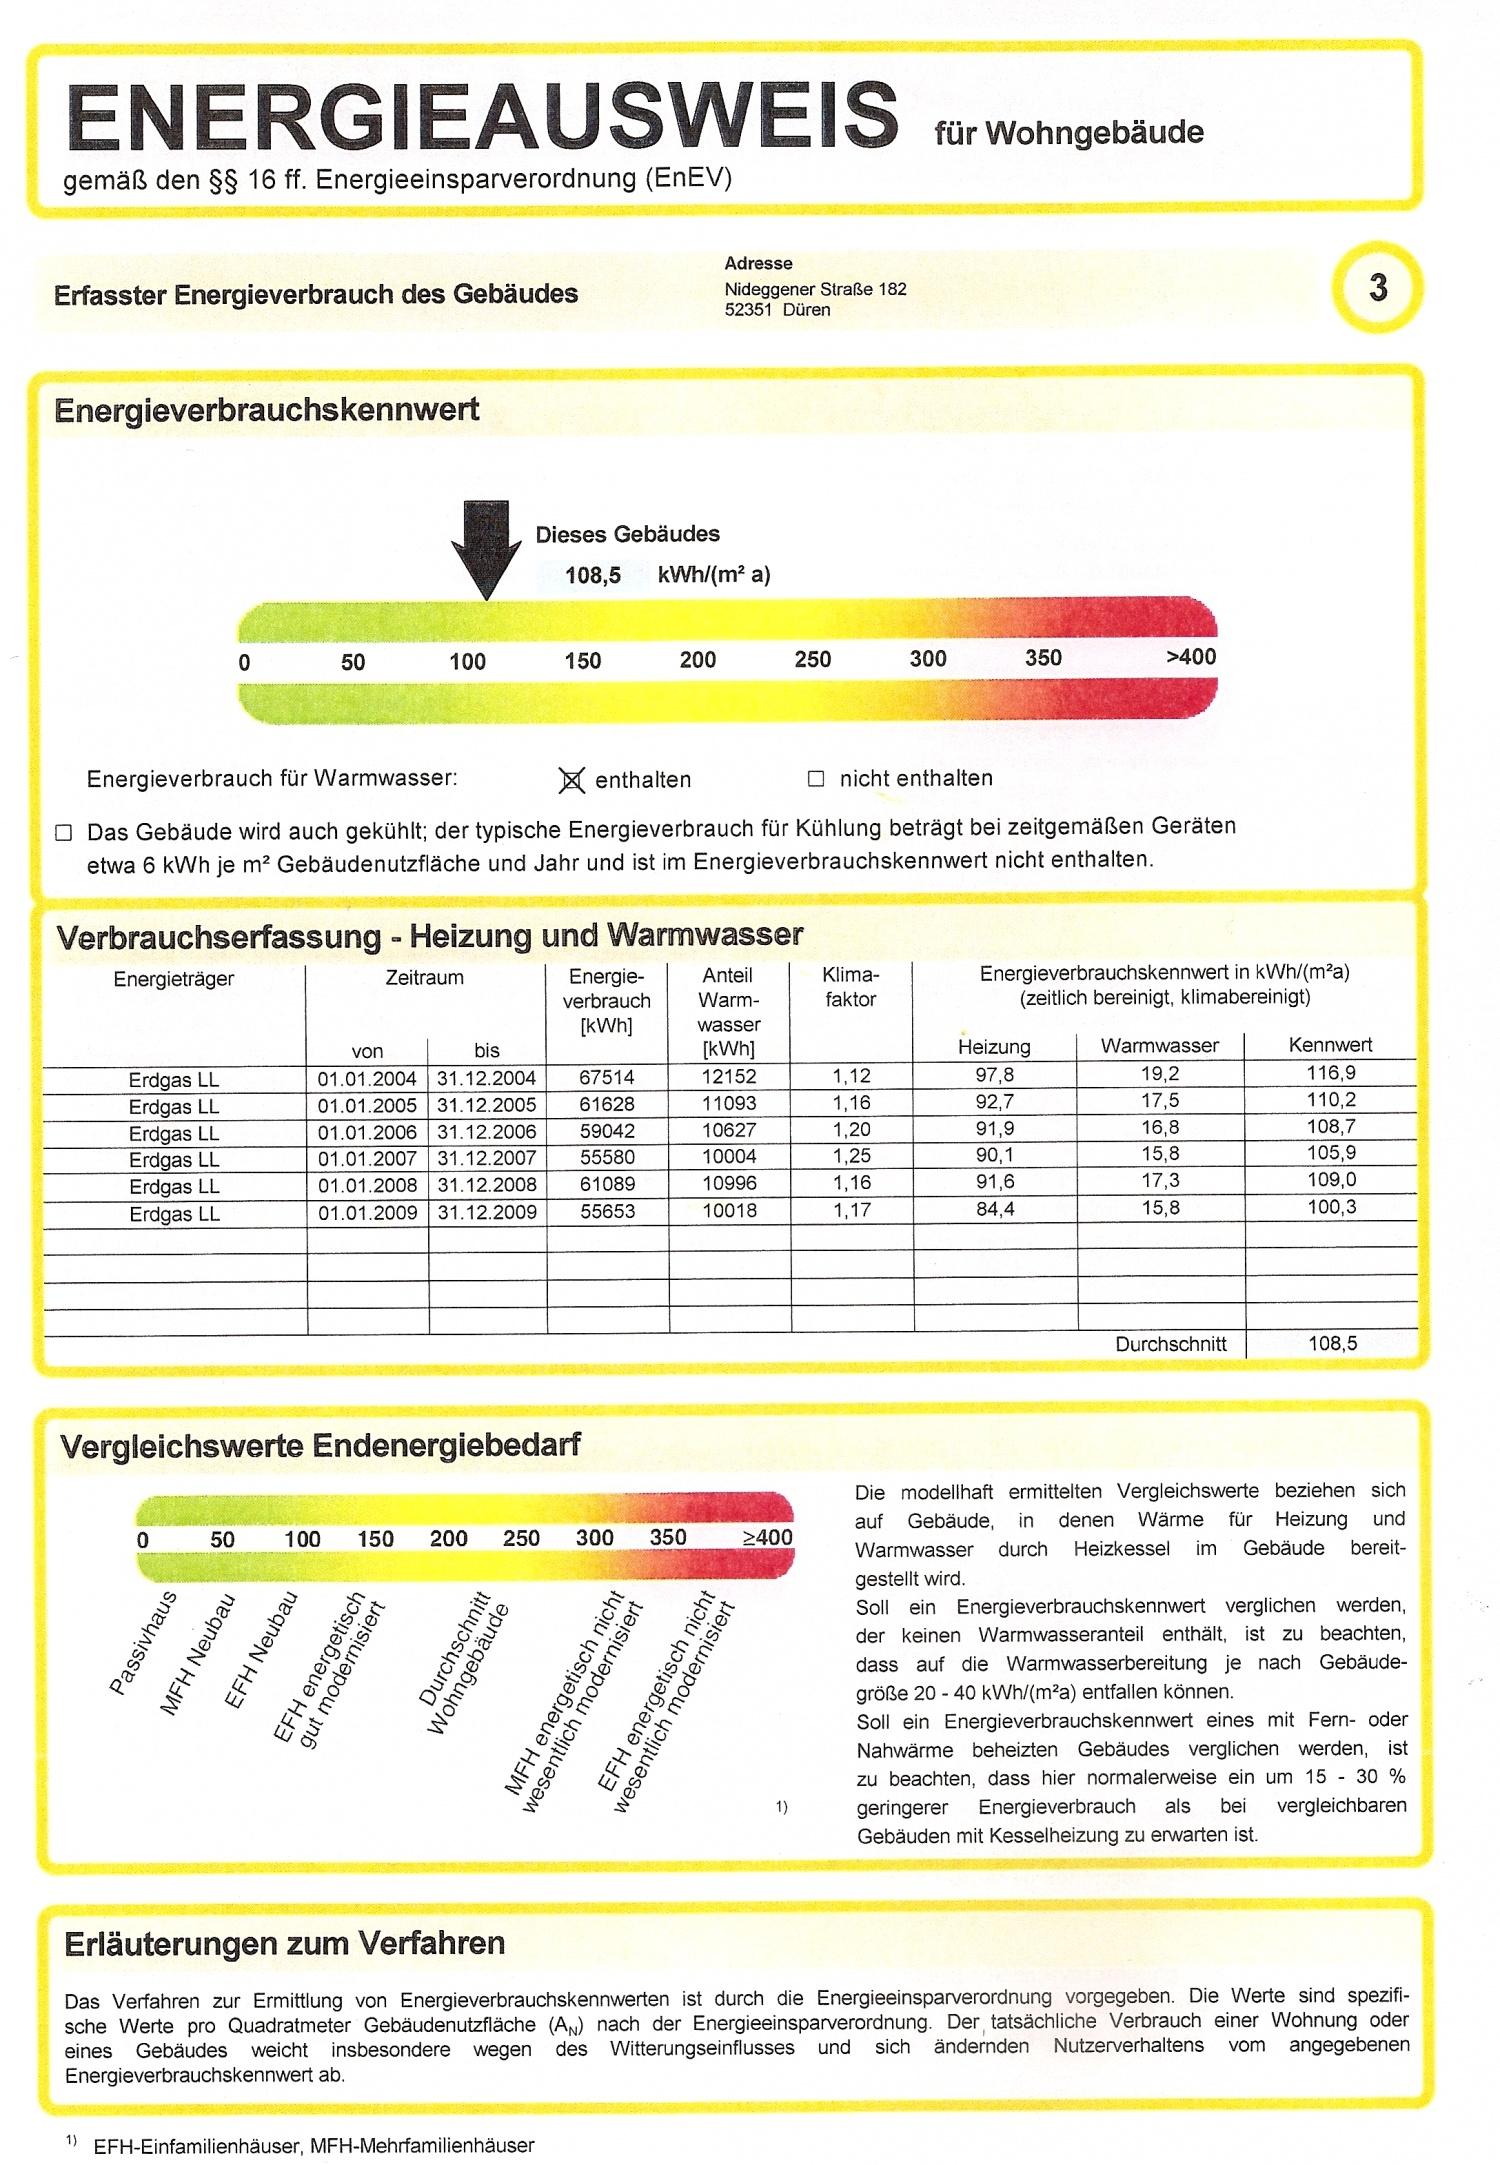 Energieausweis Nideggener Str.  (1)